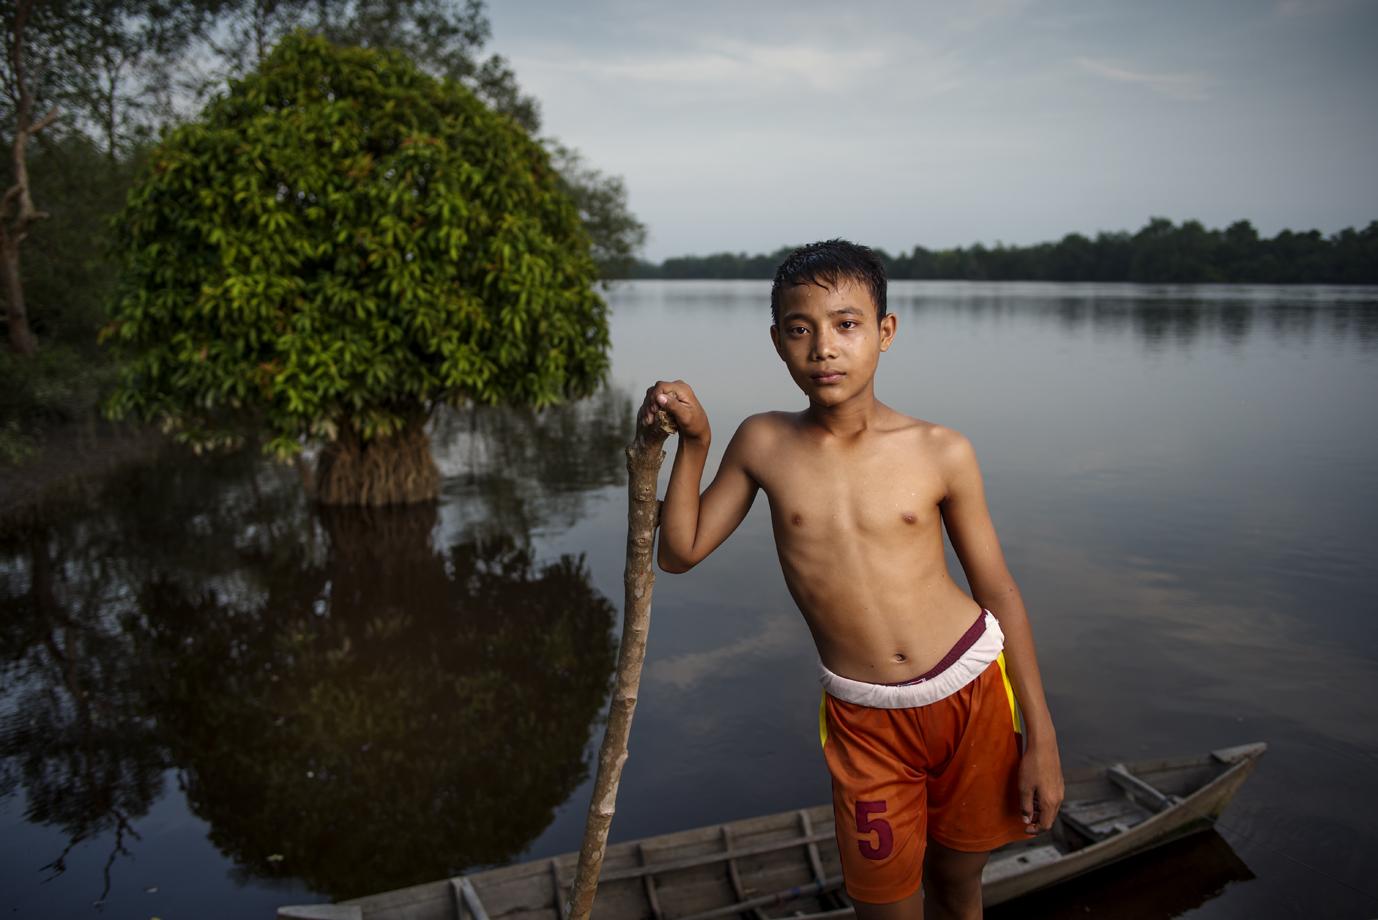 Boy at Siak river, Sumatra / Indonesia